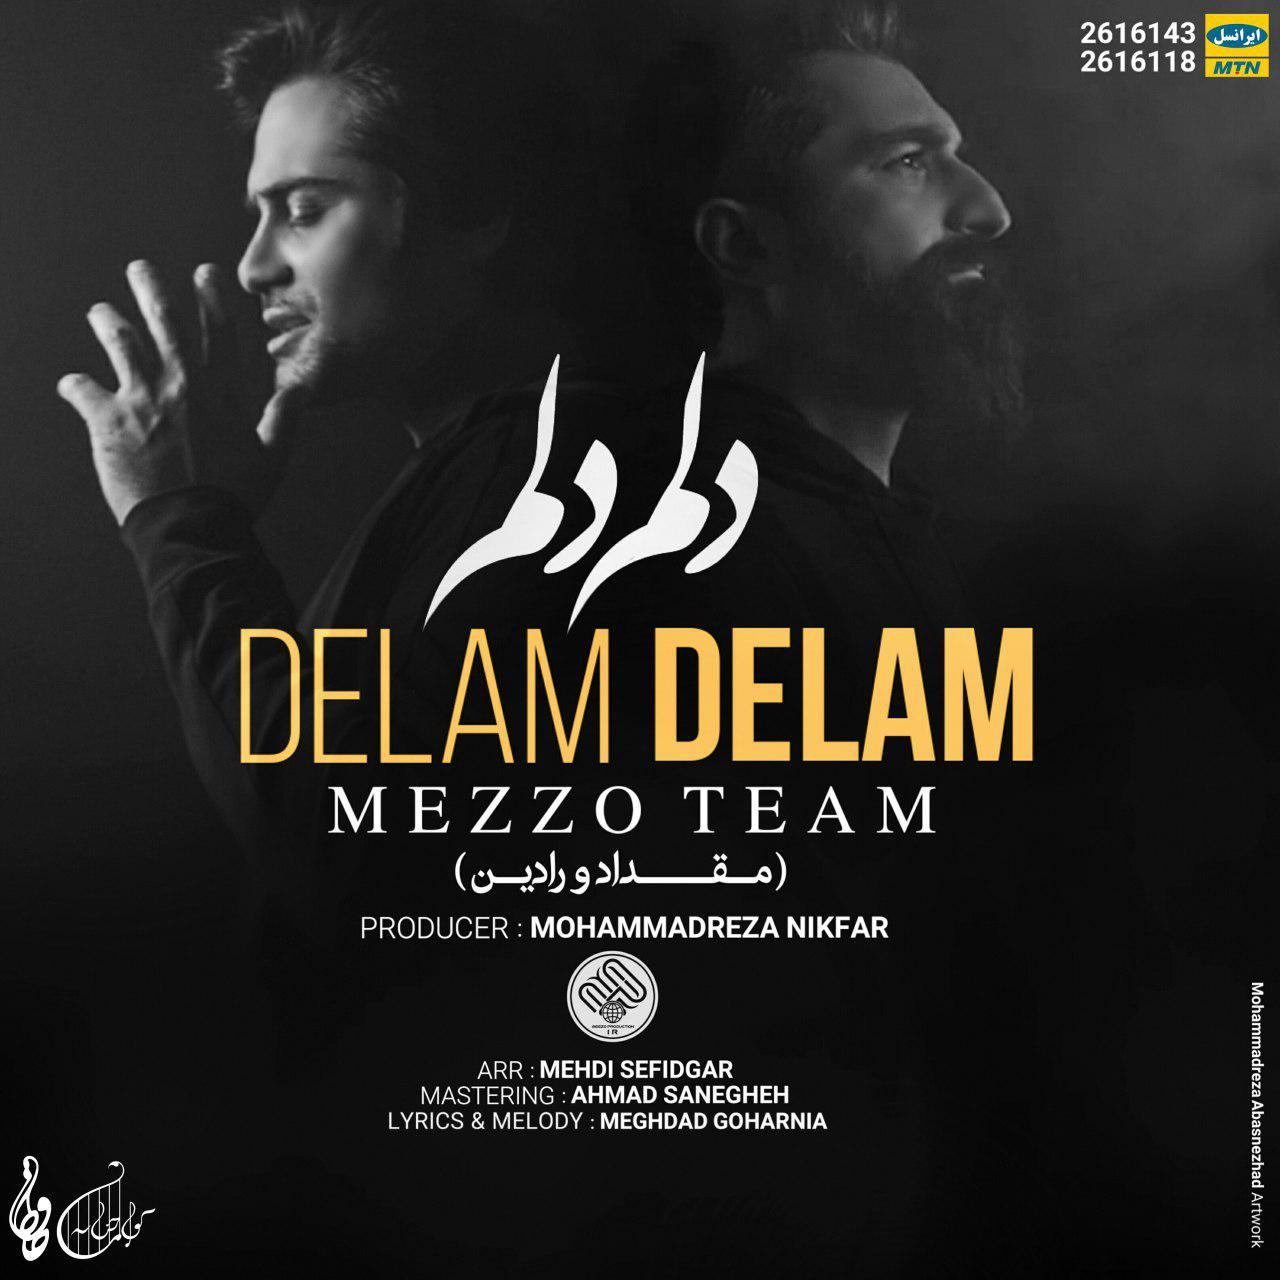 Mezzo Team (Meghdad & Radin) – Delam Delam